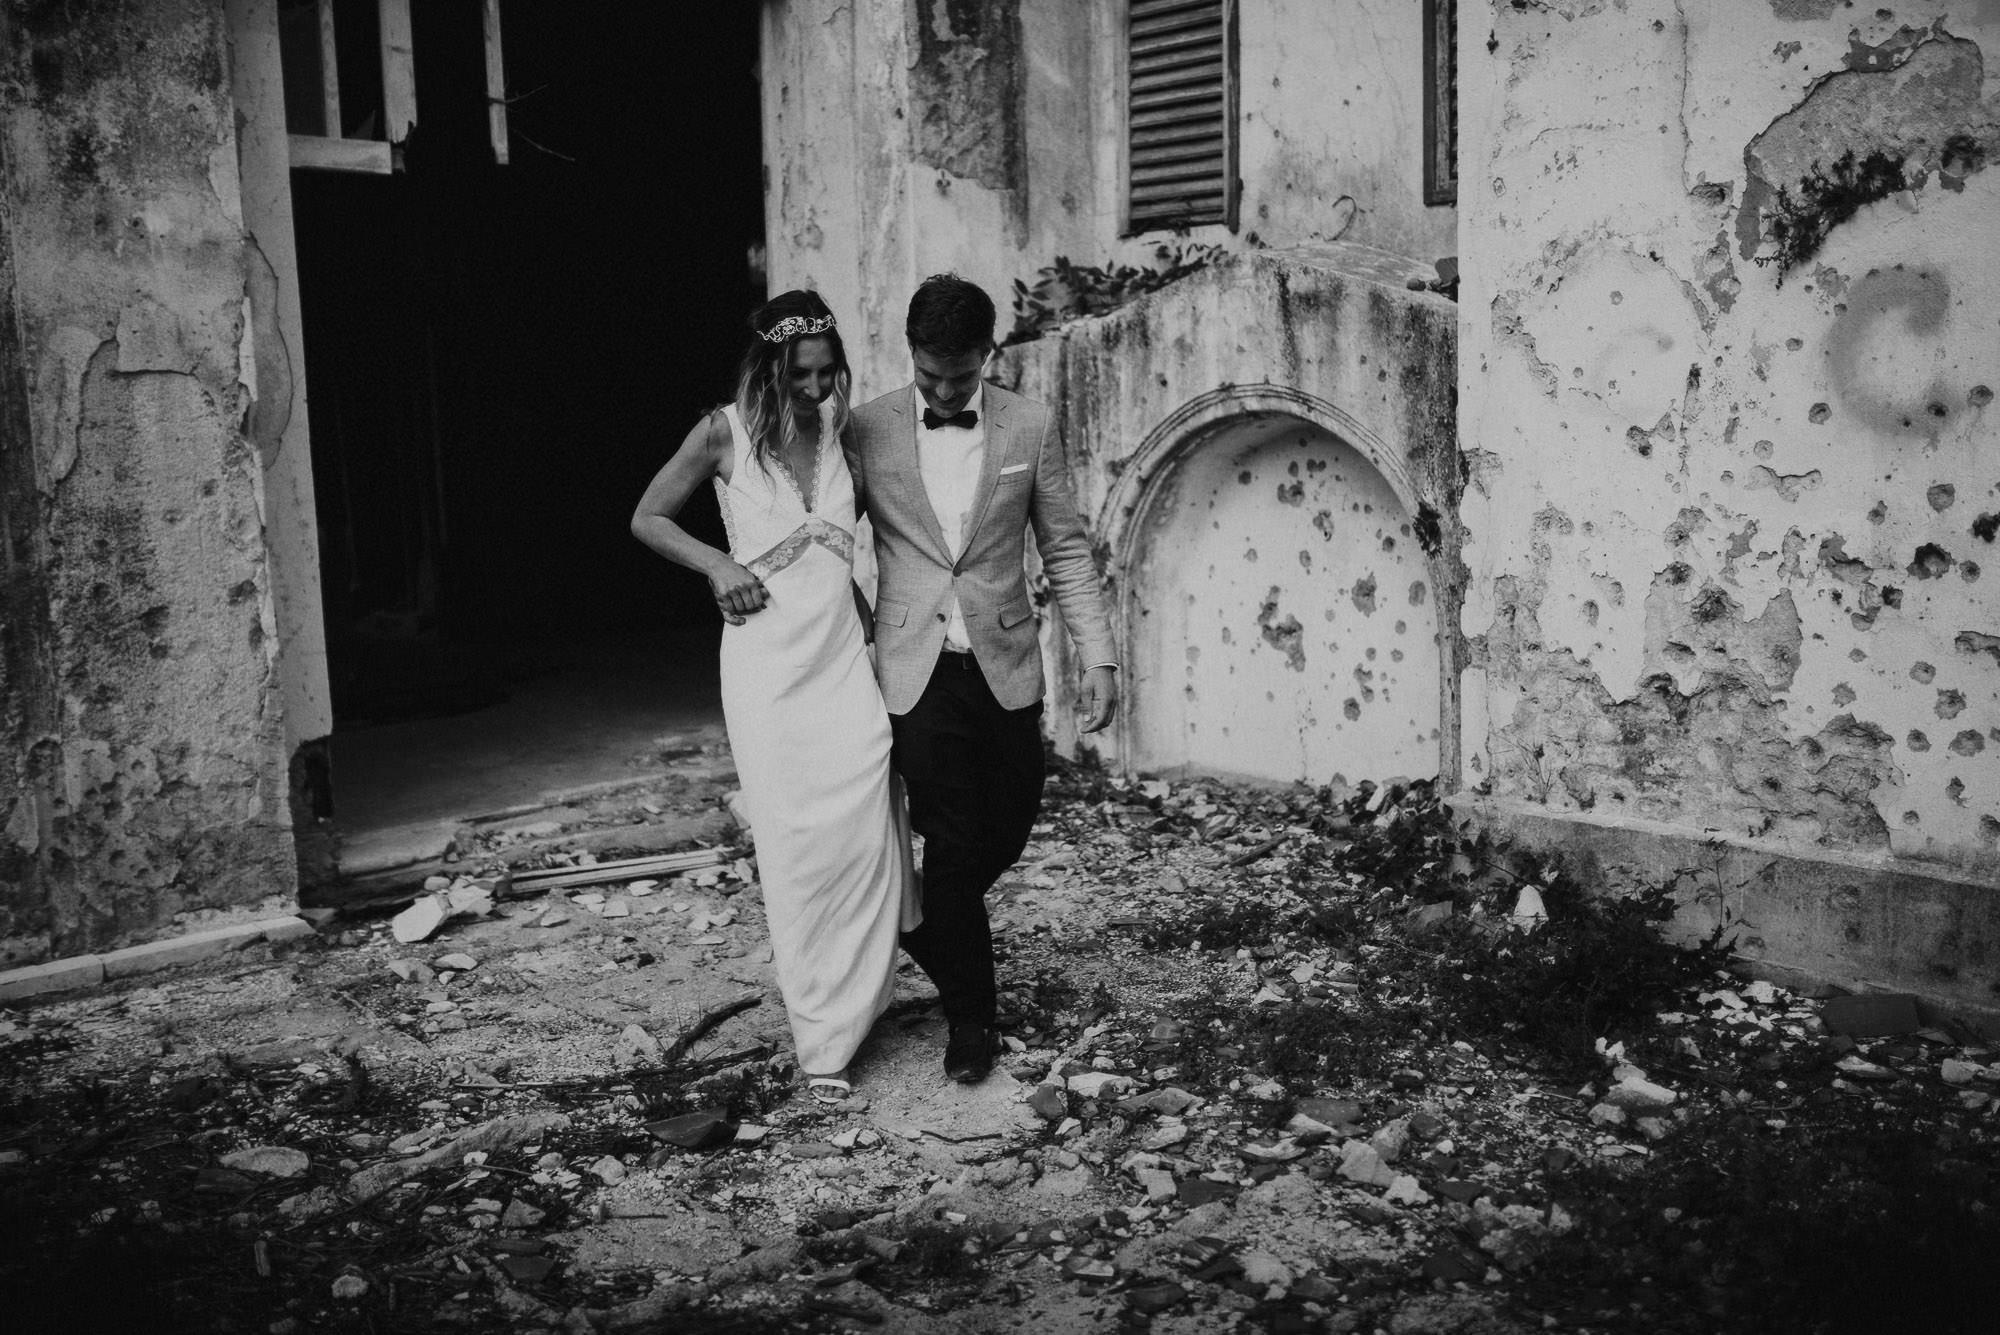 dubrovnik_croatia_wedding_photographer-jere_satamo-destination_weddings-111-web.jpg